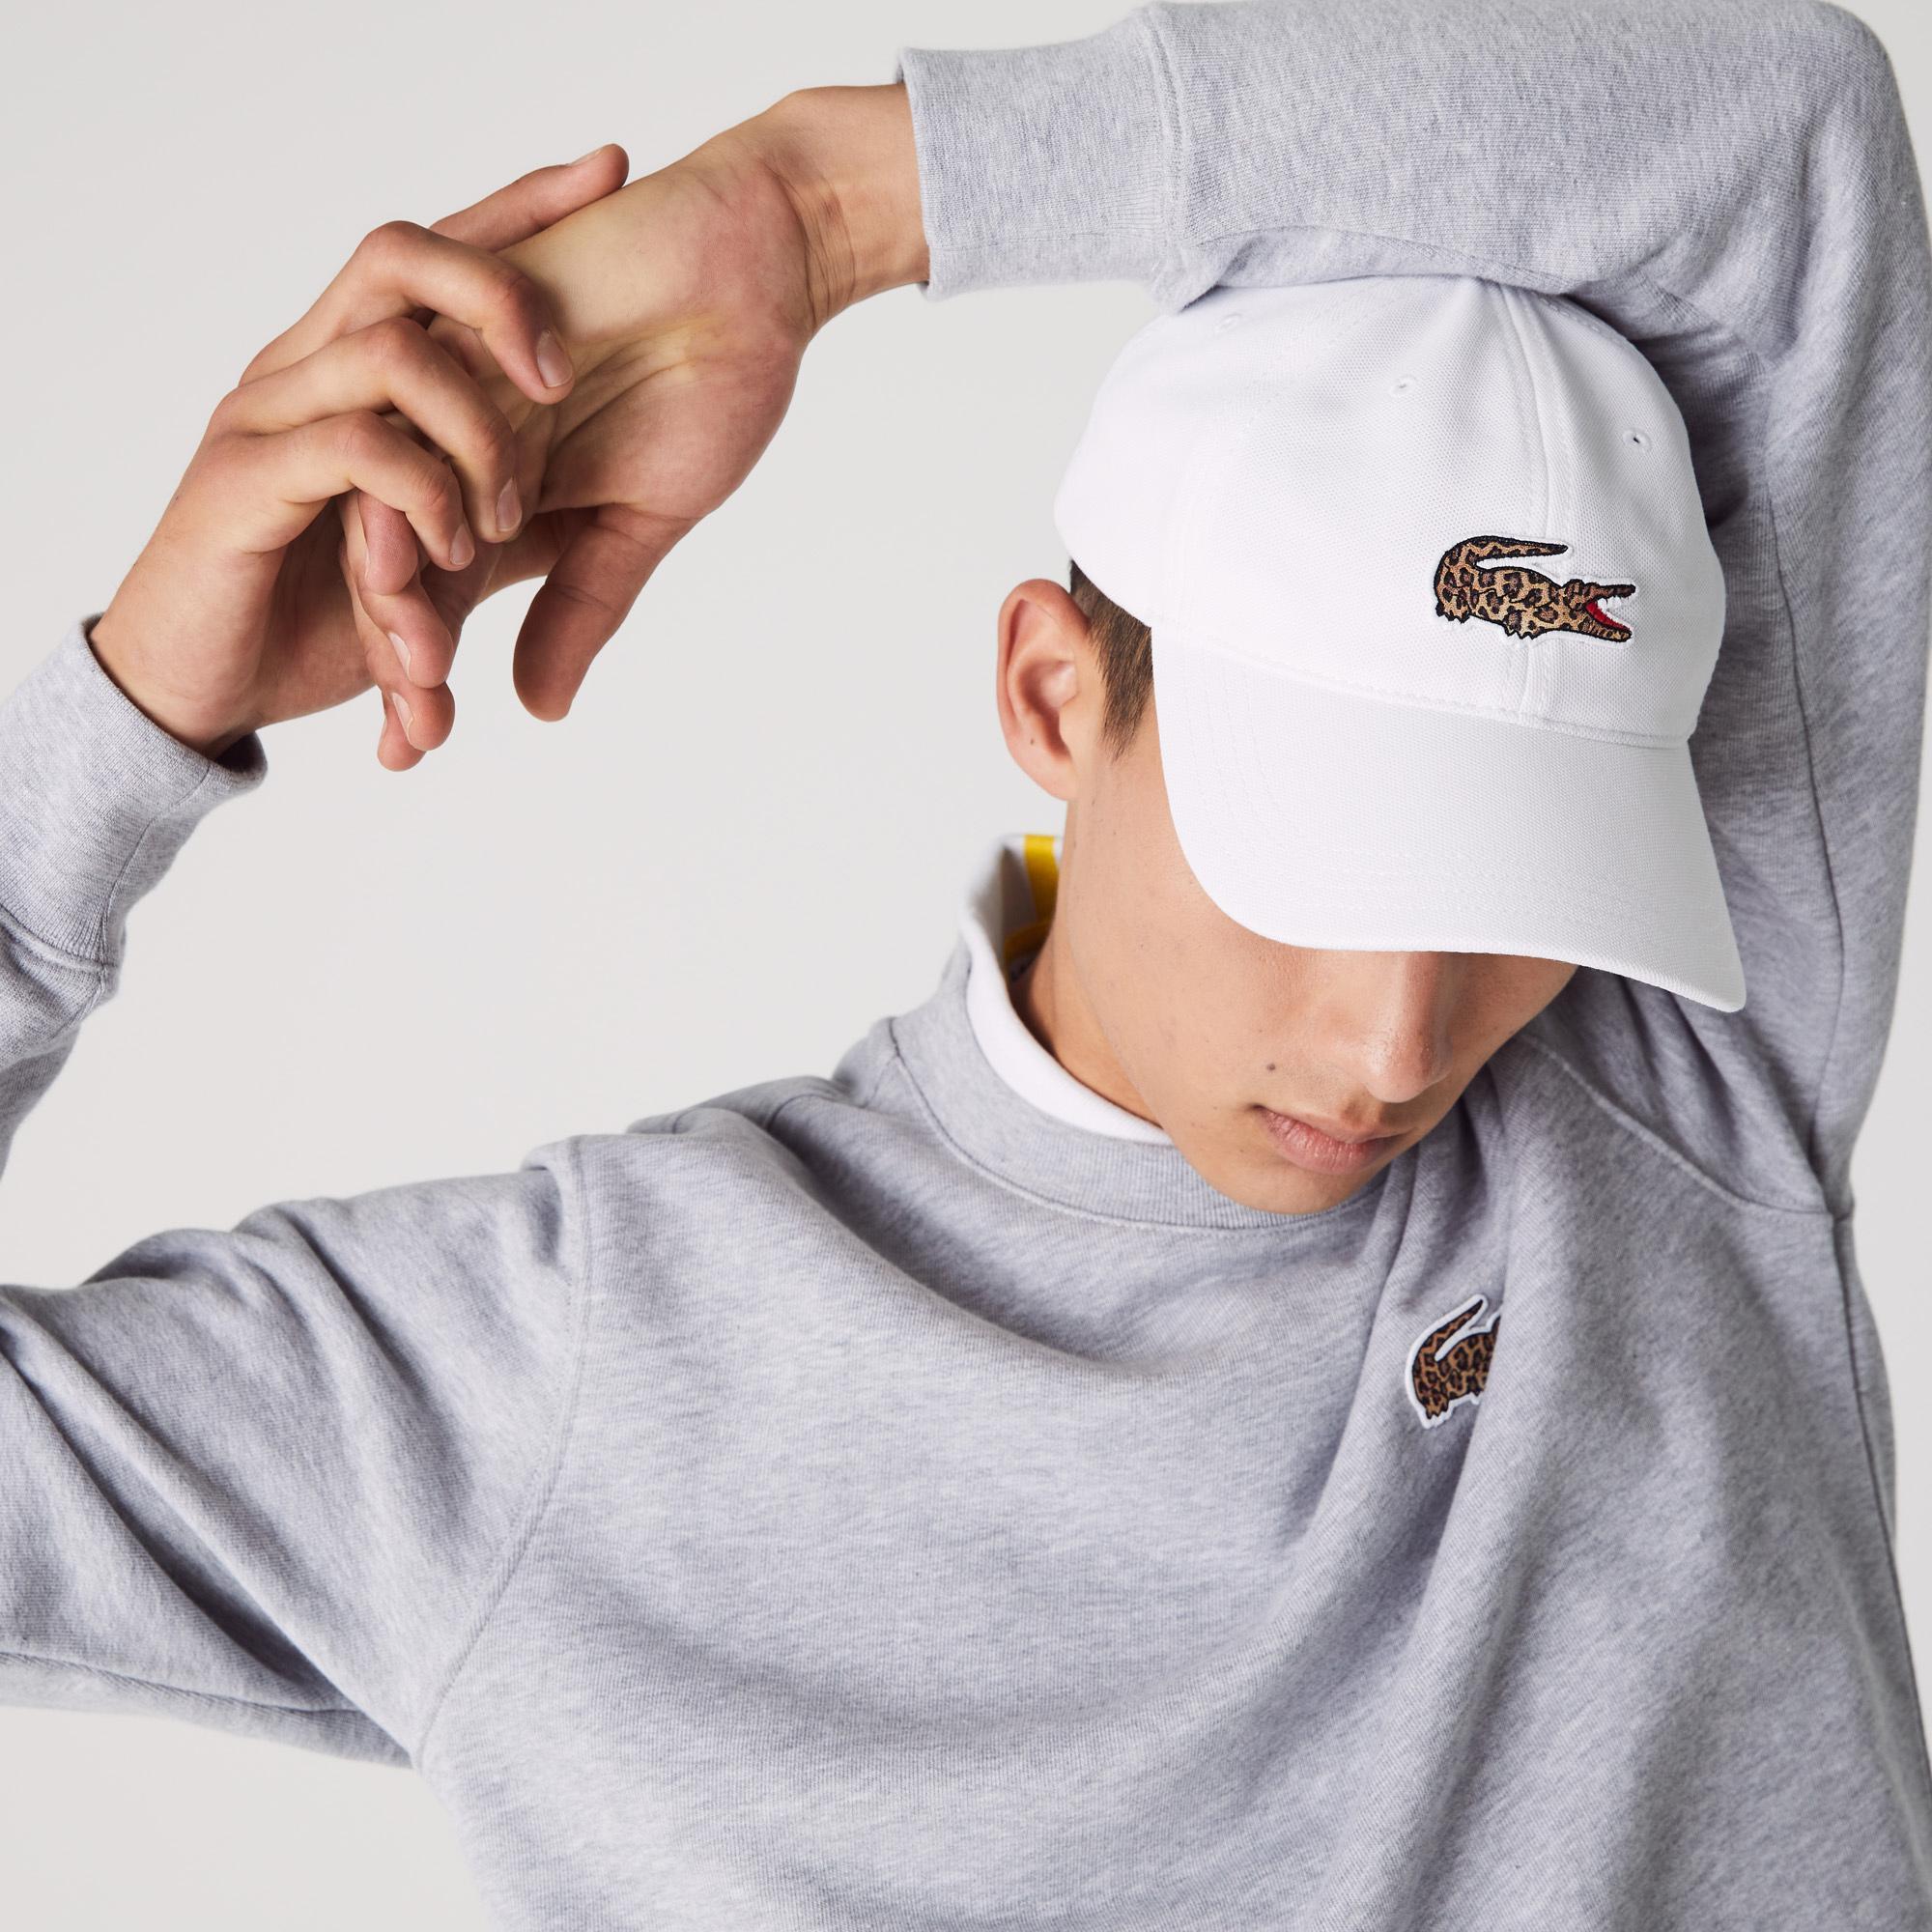 Lacoste x National Geographic Unisex Beyaz Şapka